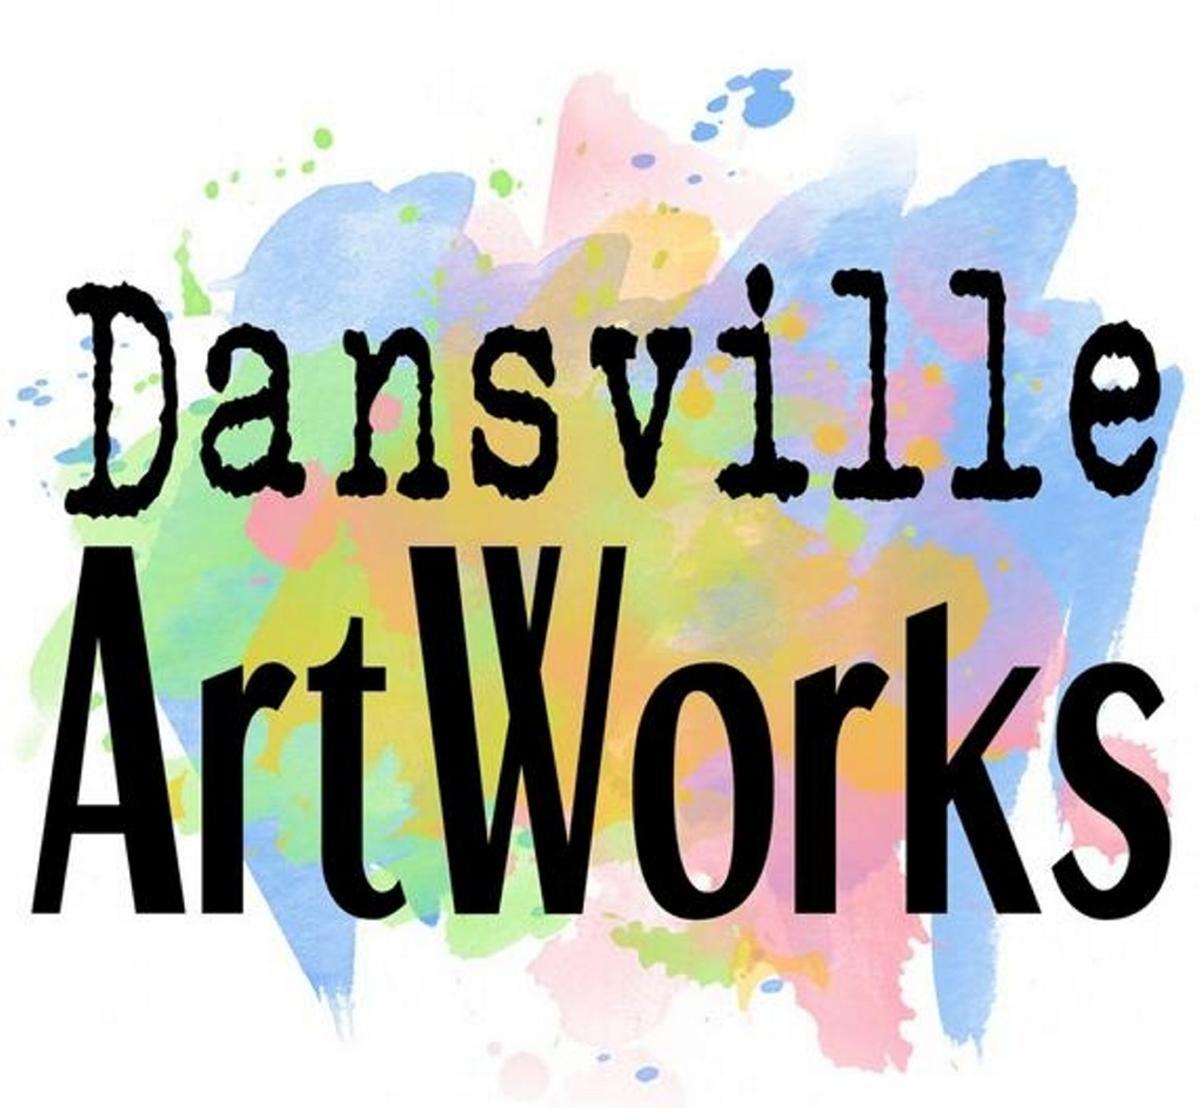 ArtWorks plans reorganization Post-pandemic, nonprofit to focus on partnerships, economy